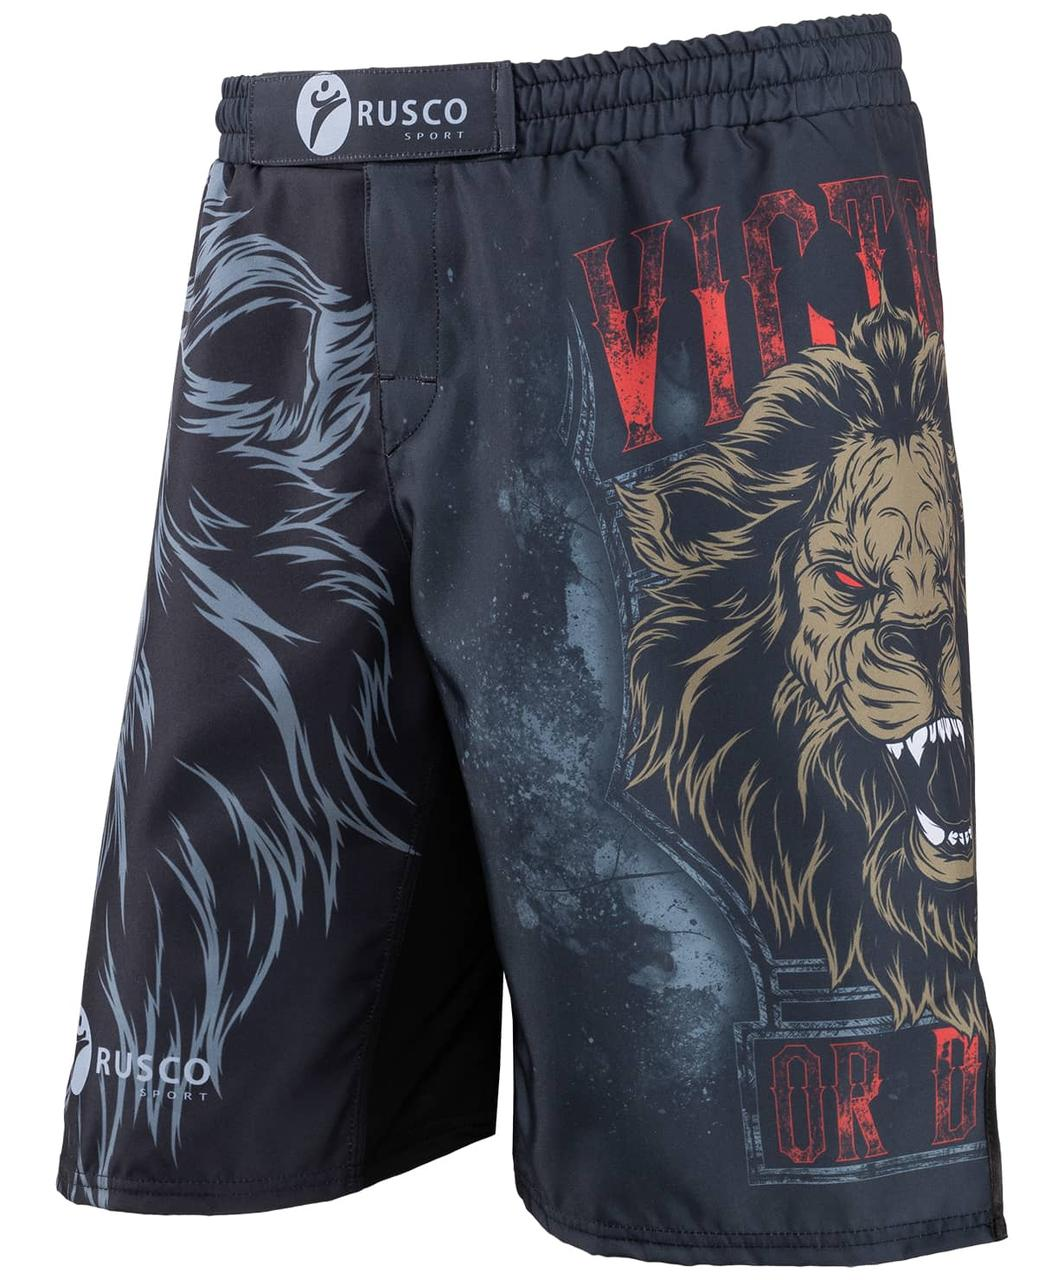 Шорты для MMA Lion, взрослые Rusco